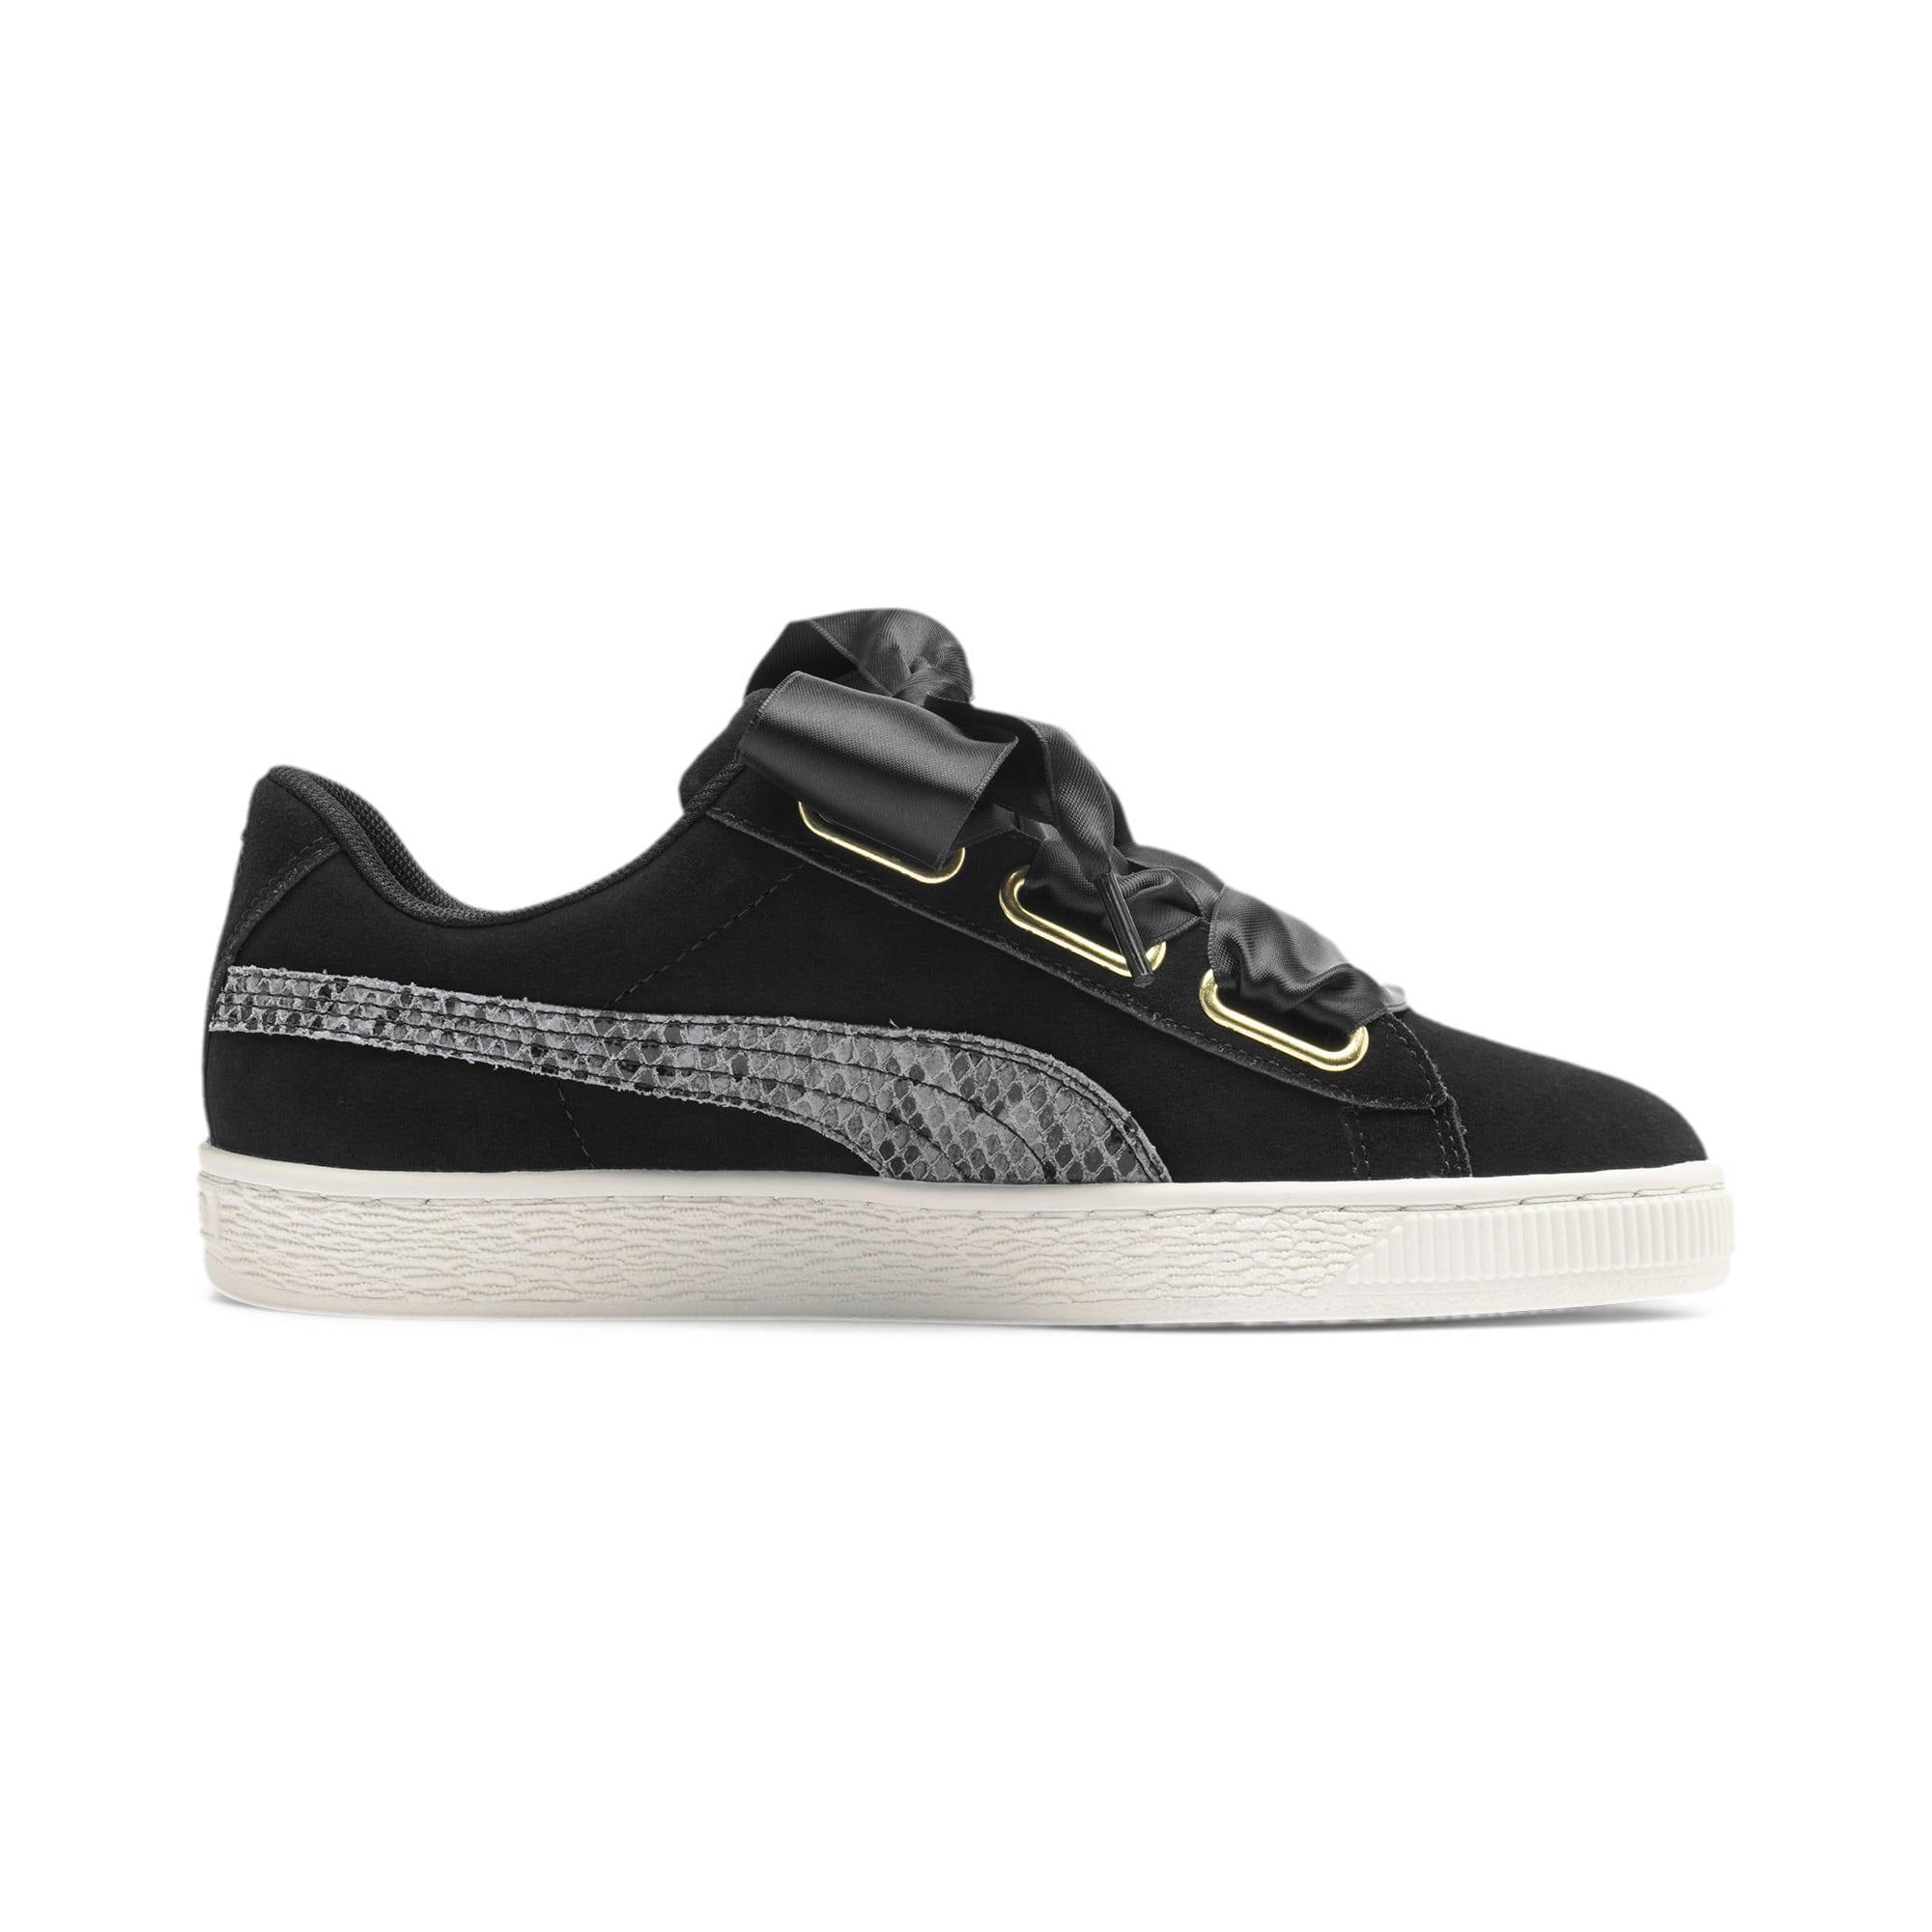 Thumbnail 6 of Suede Heart Snake Lux Women's Sneakers, Puma Black-Puma Team Gold, medium